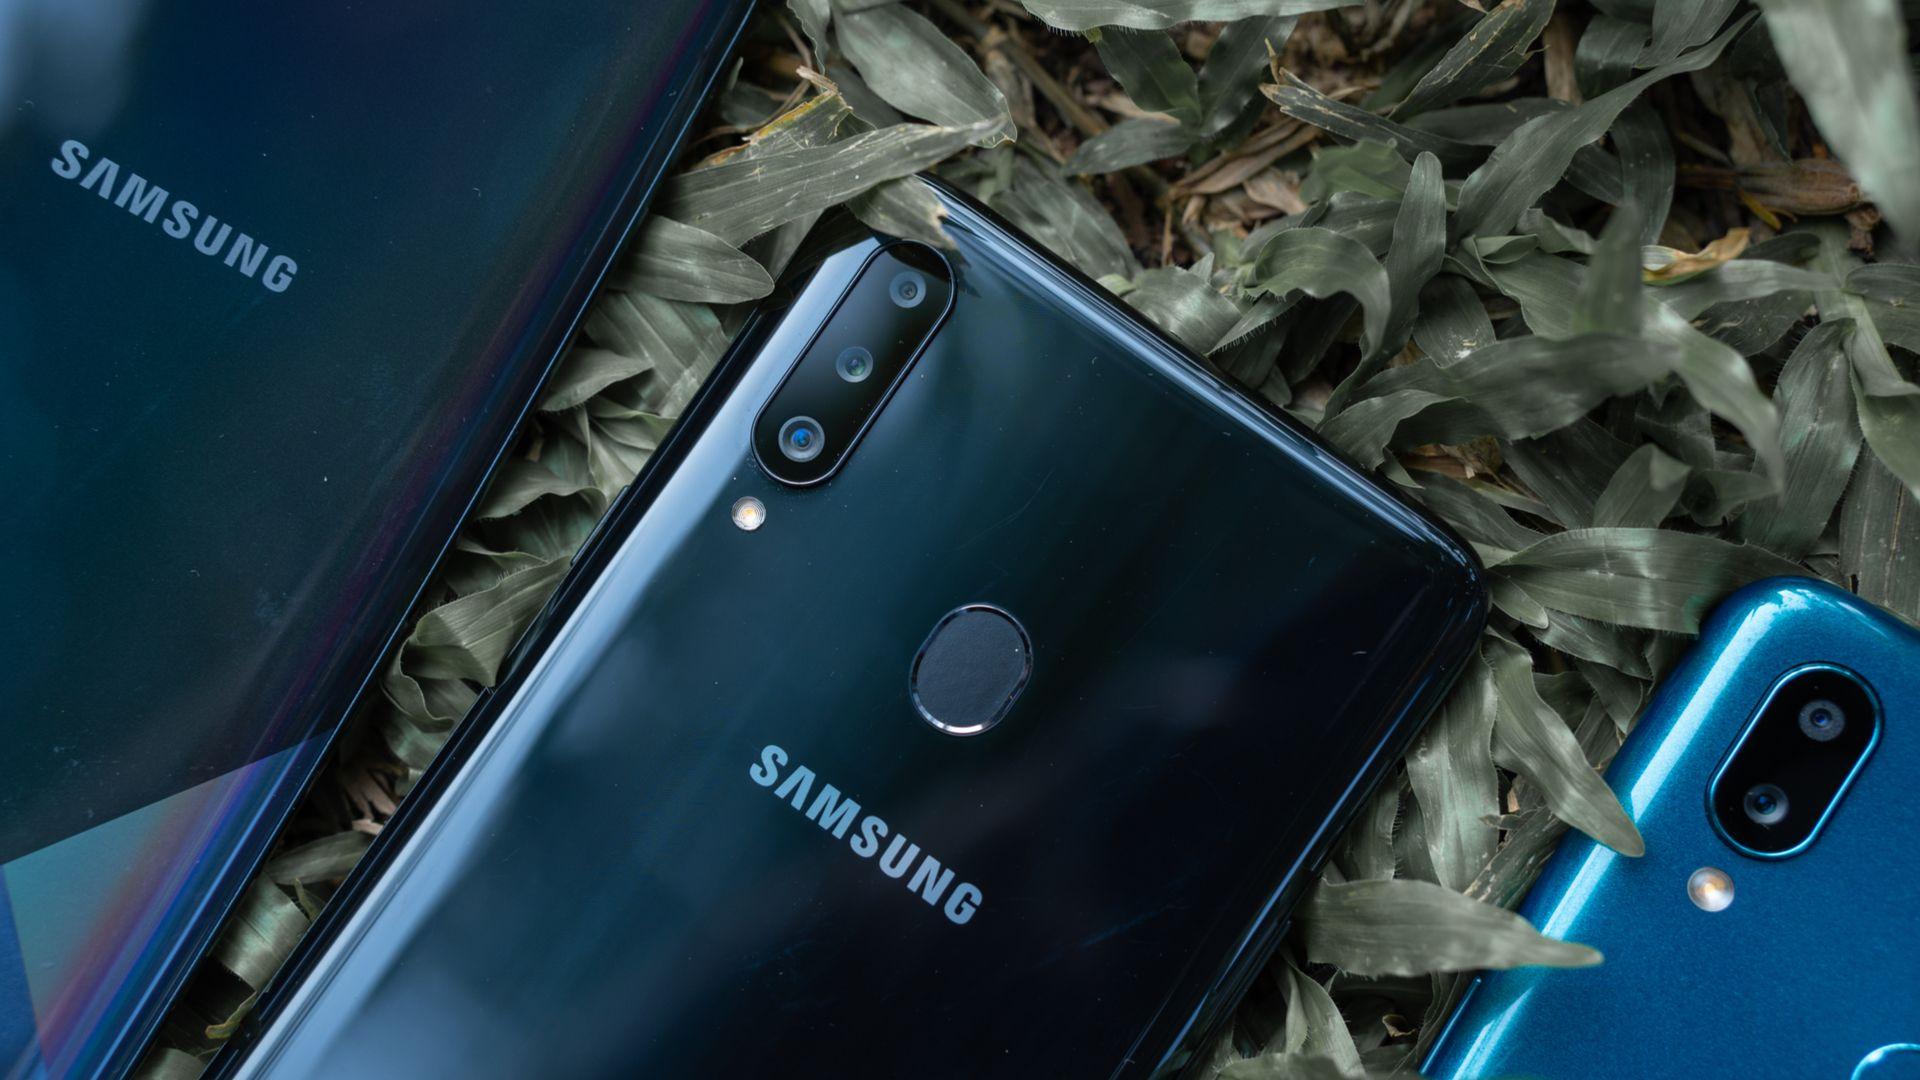 Galaxy A21s deve ter 5.000 mAh de bateria. (Imagem: Lukmanazis/Shutterstock)